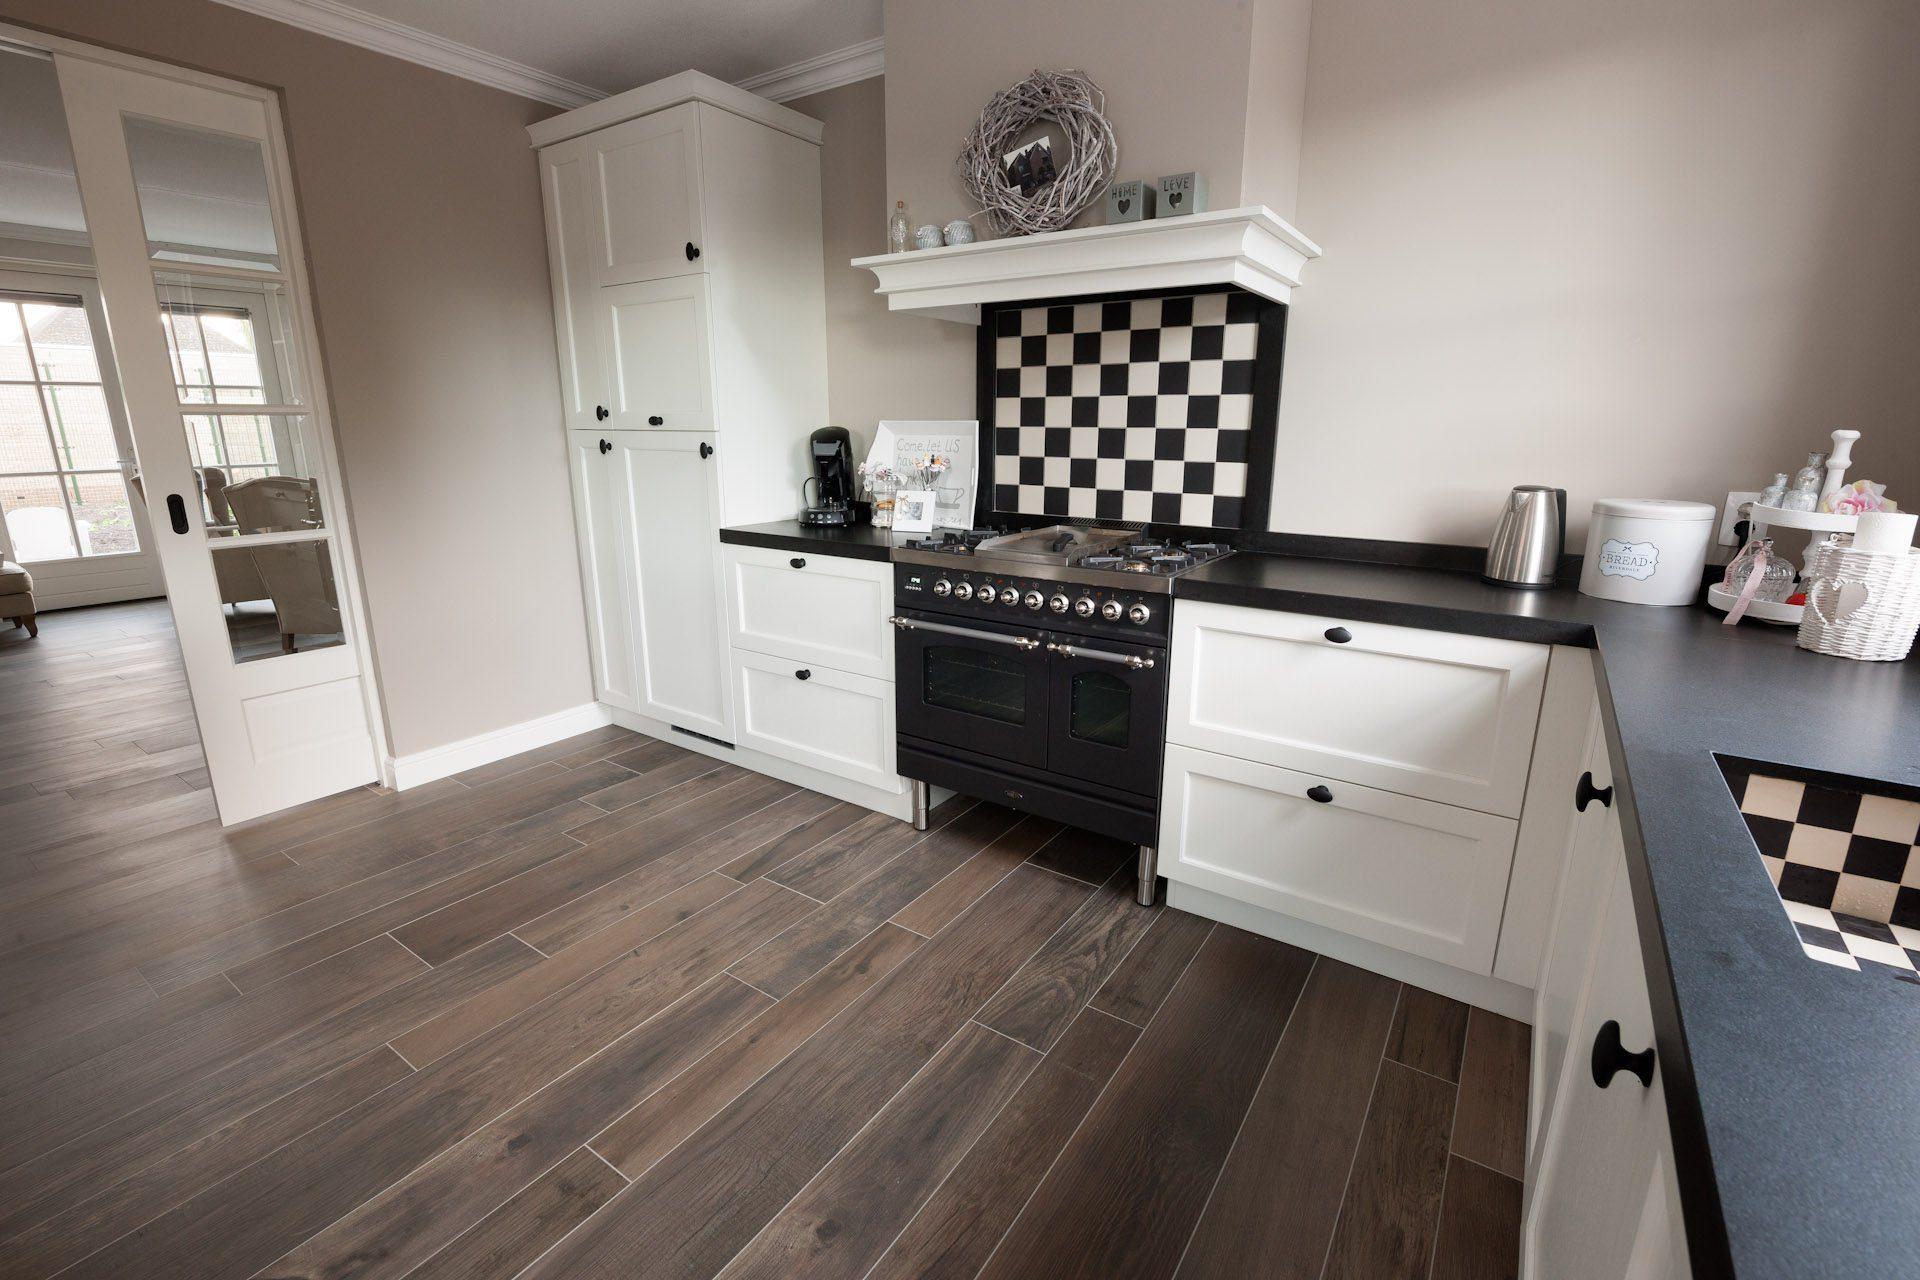 Houtlook tegels in woonkamer zwart wit geblokte vloer in hal - Keuken wit en blauw ...